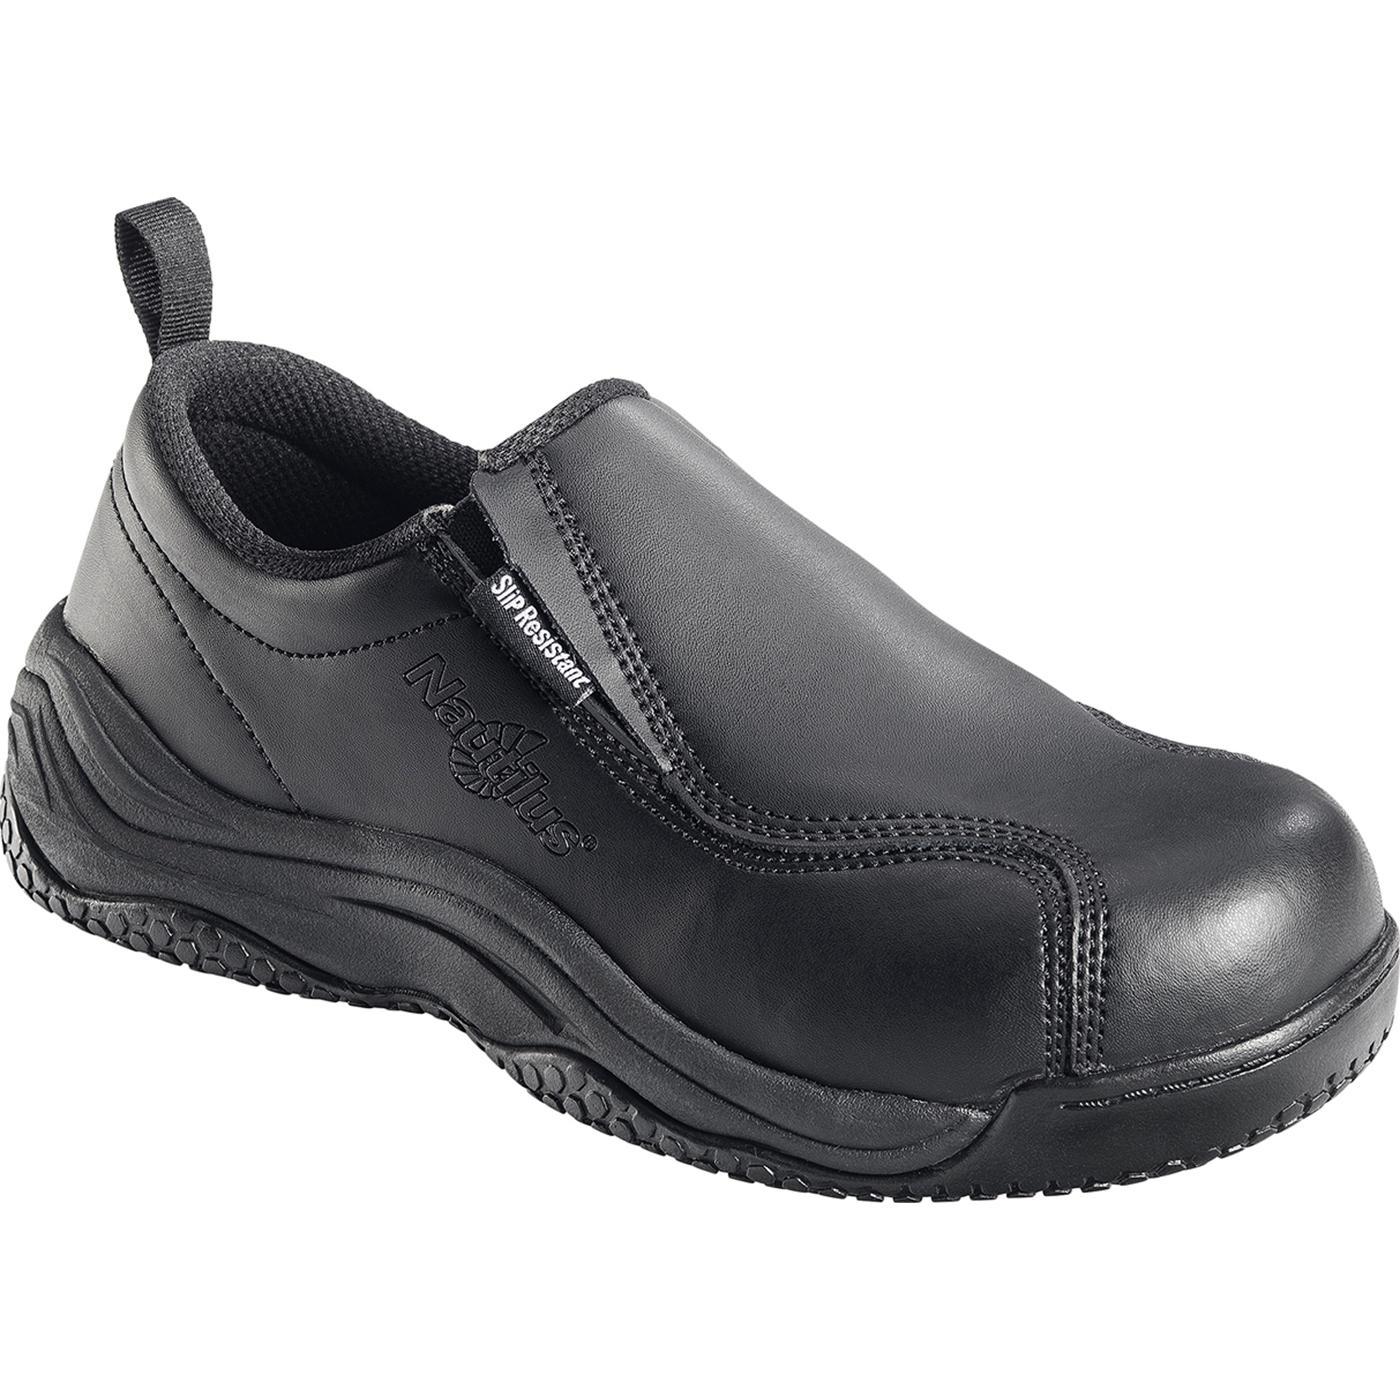 Nautilus Composite Toe Slip On Work Shoes